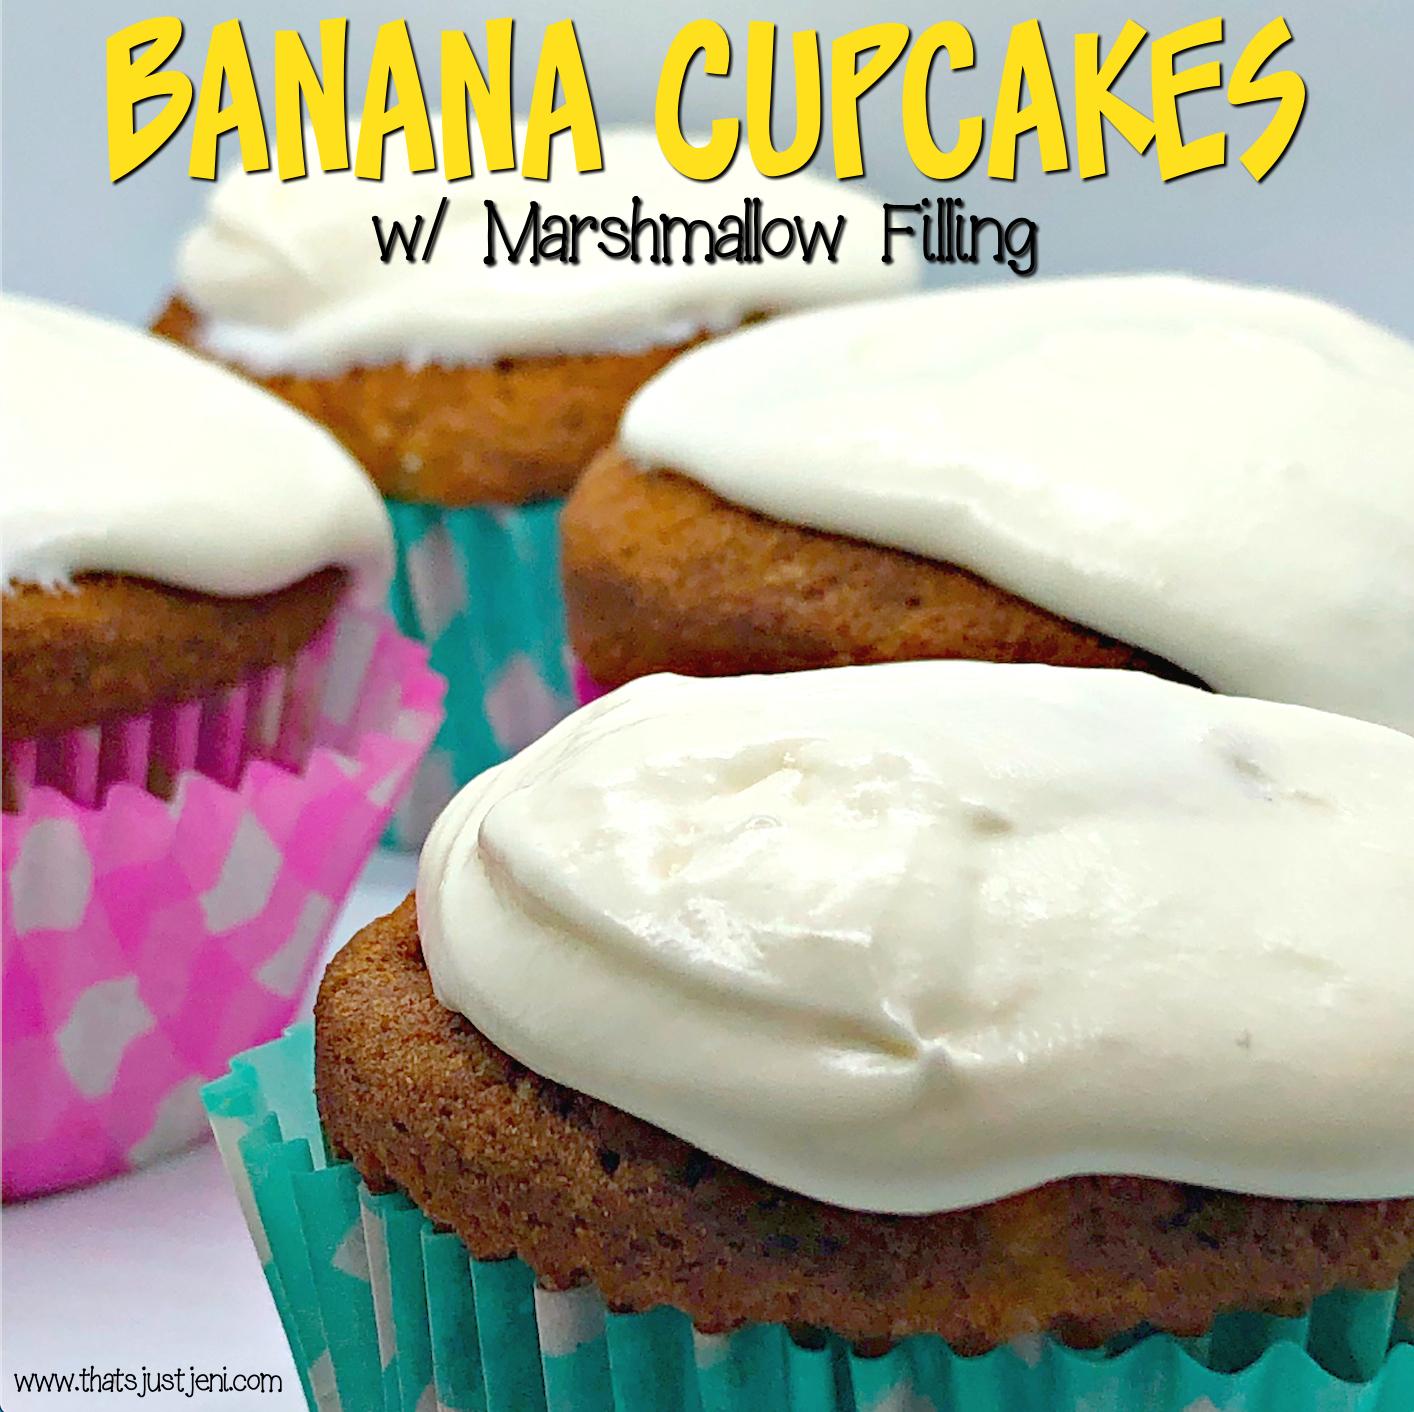 Banana Cupcakes with Marshmallow Filling Recipe